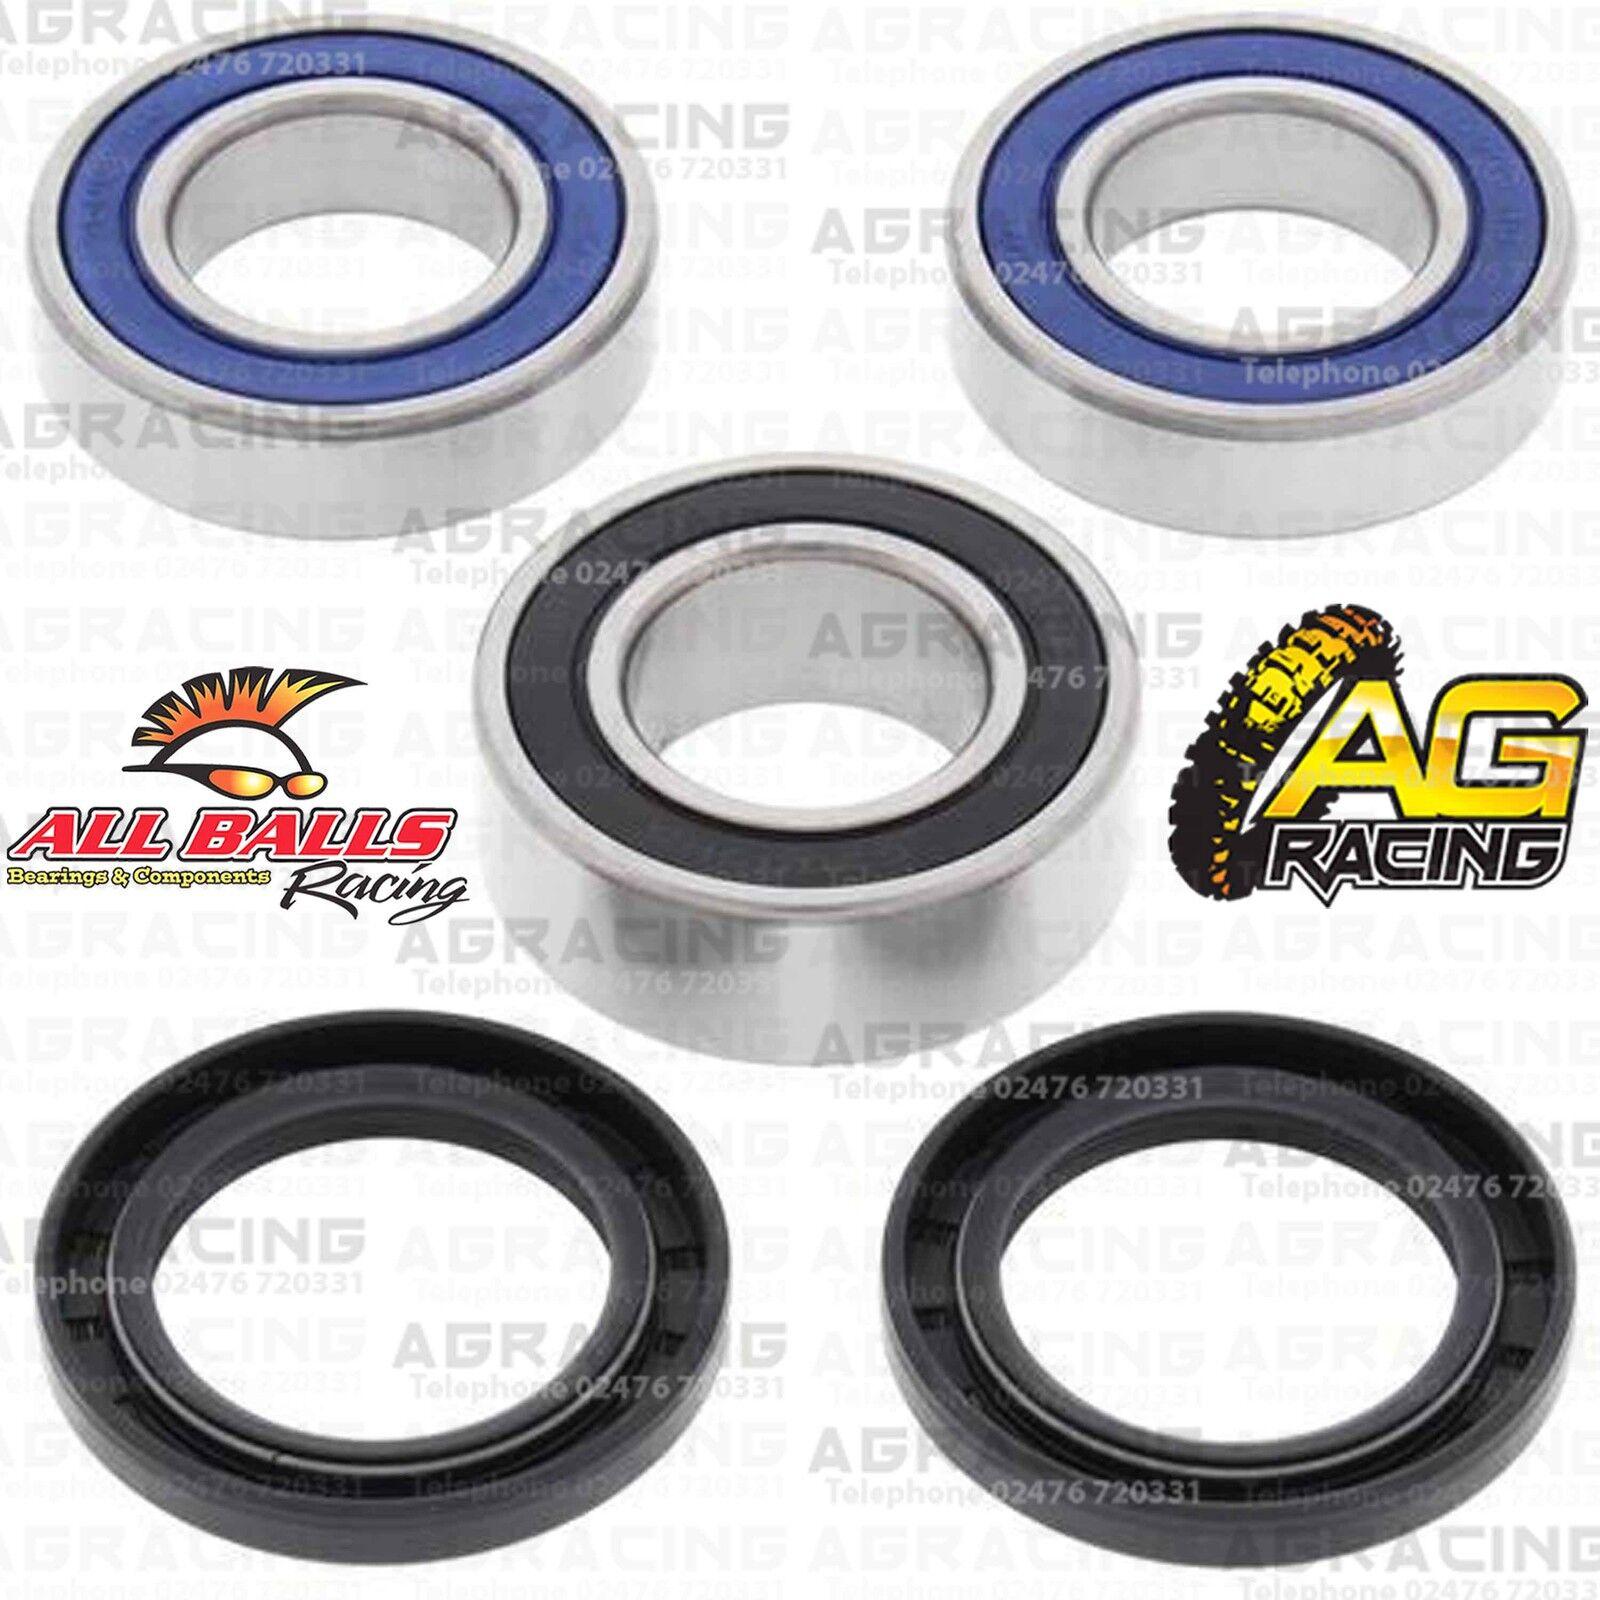 All Balls Rear Wheel Bearing /& Seals Kit For Sherco Enduro SE 300i FS 2012-2013